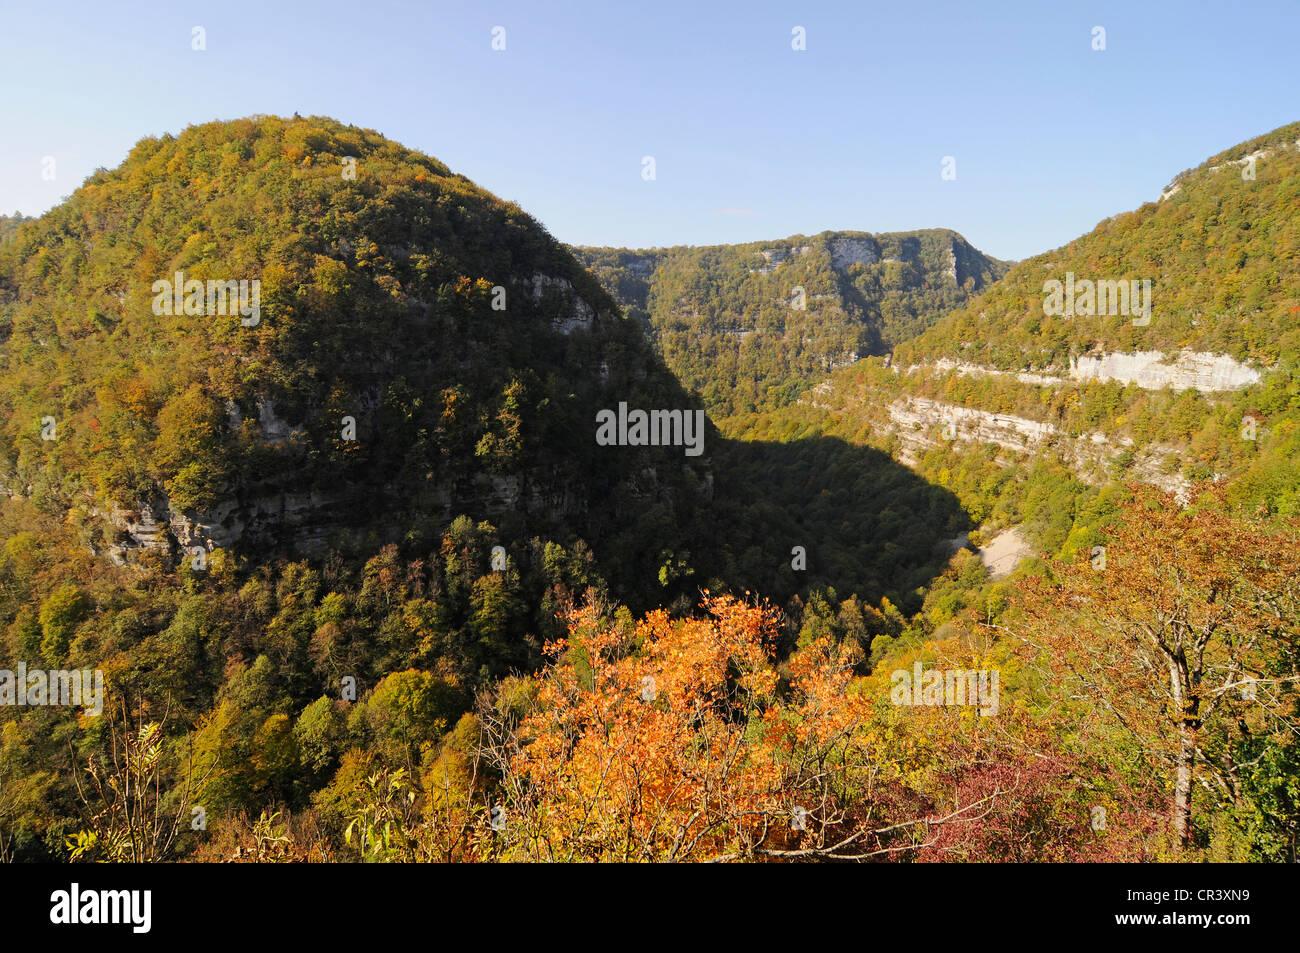 Valley of the Loue River, autumnal landscape, Ornans, Besancon, departement of Doubs, Franche-Comte, France, Europe - Stock Image